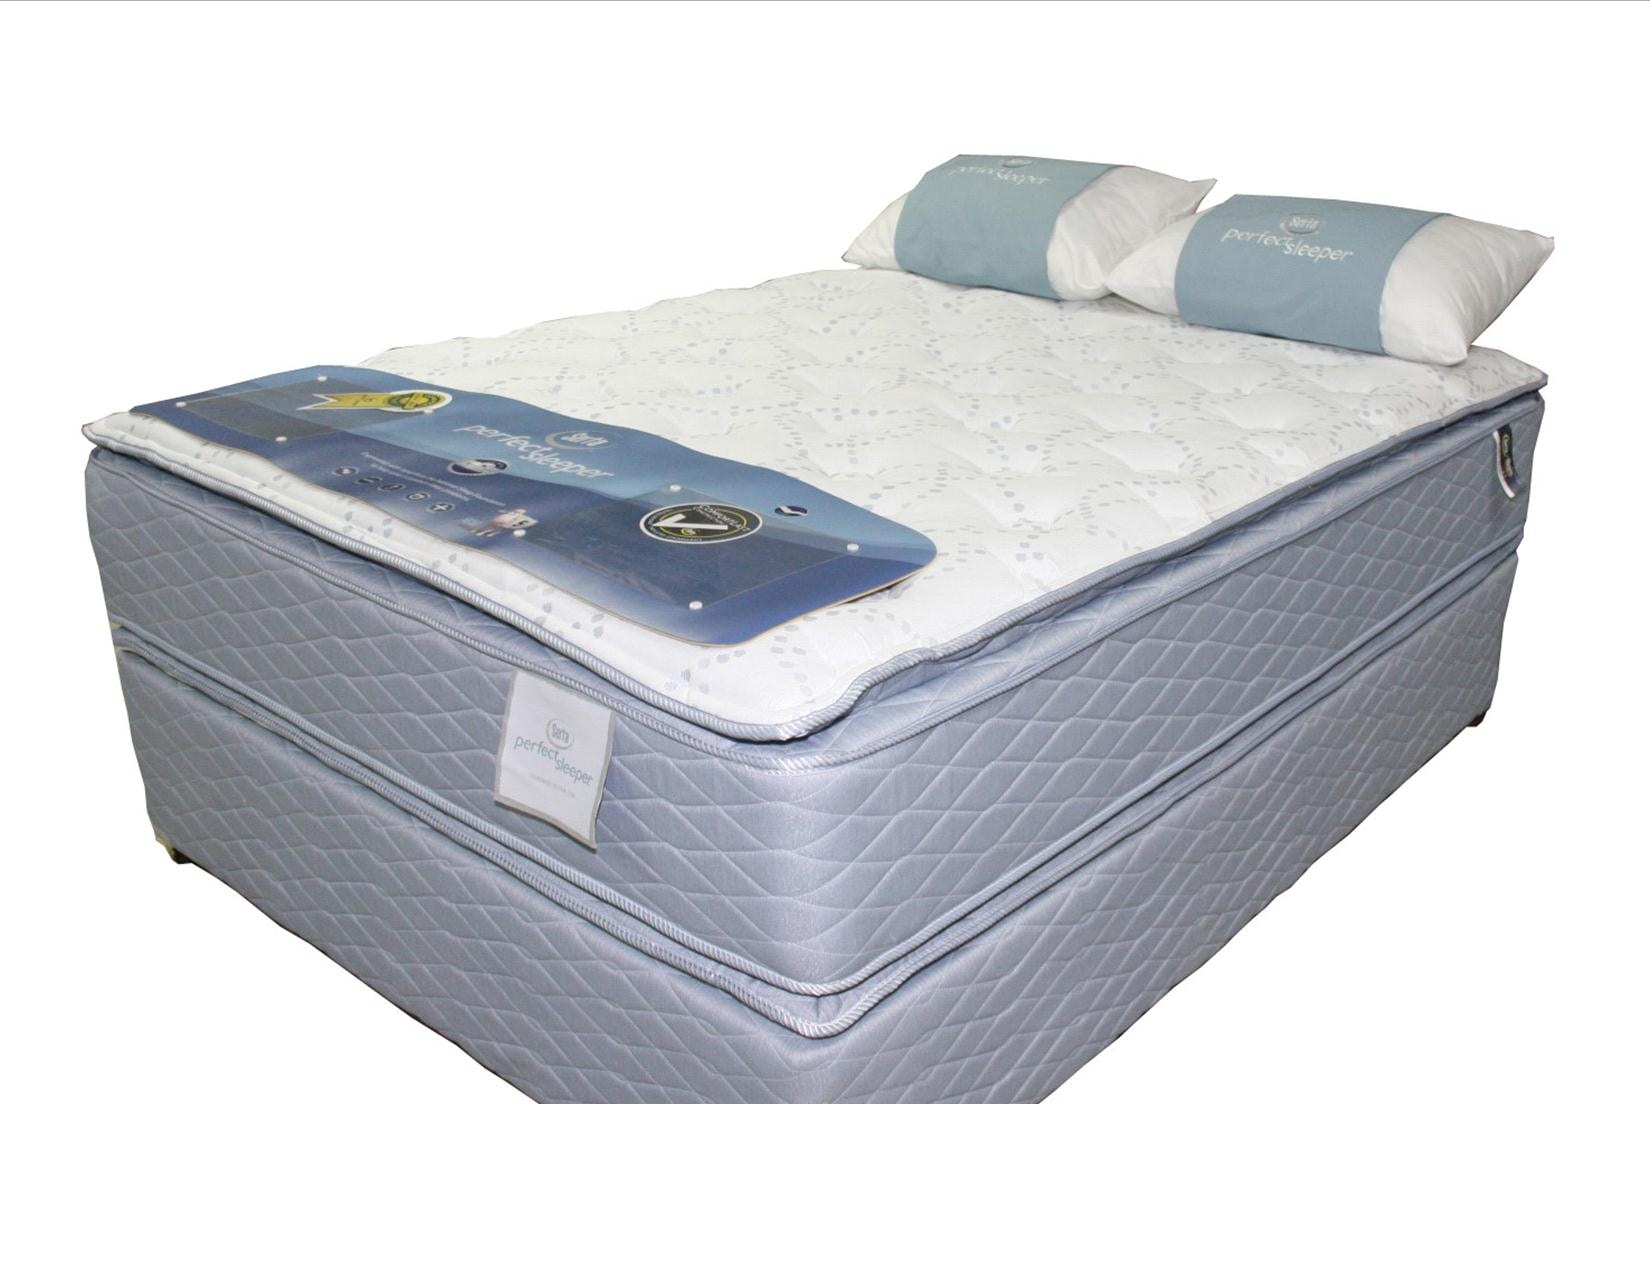 Serta Mattresses Serta Perfect Sleeper Brockland Plush